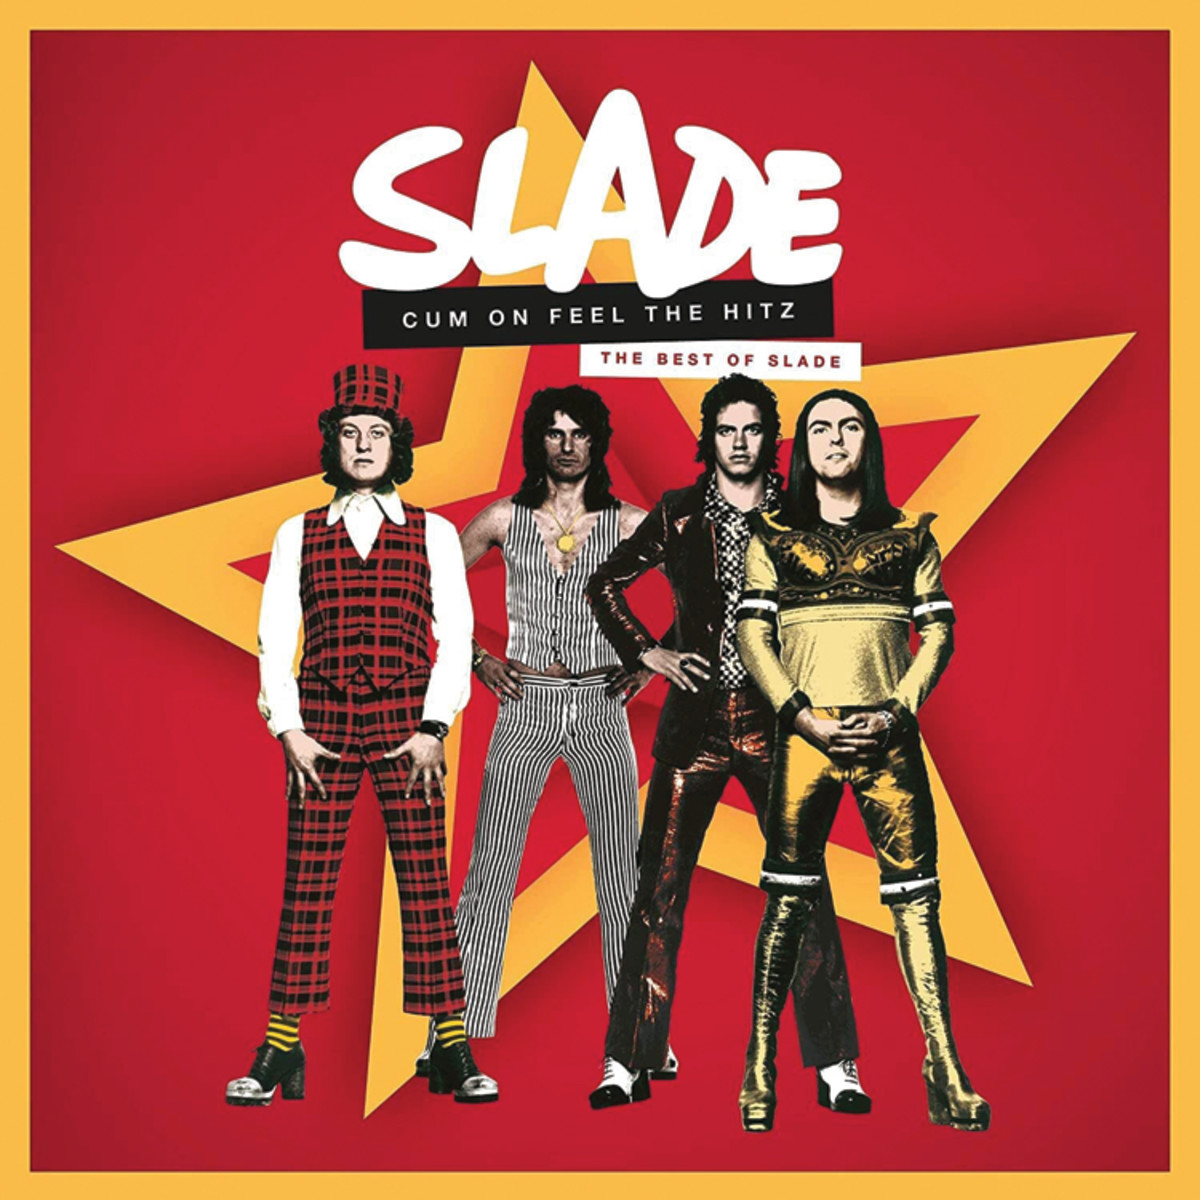 slade_-_cum_on_feel_the_hitz